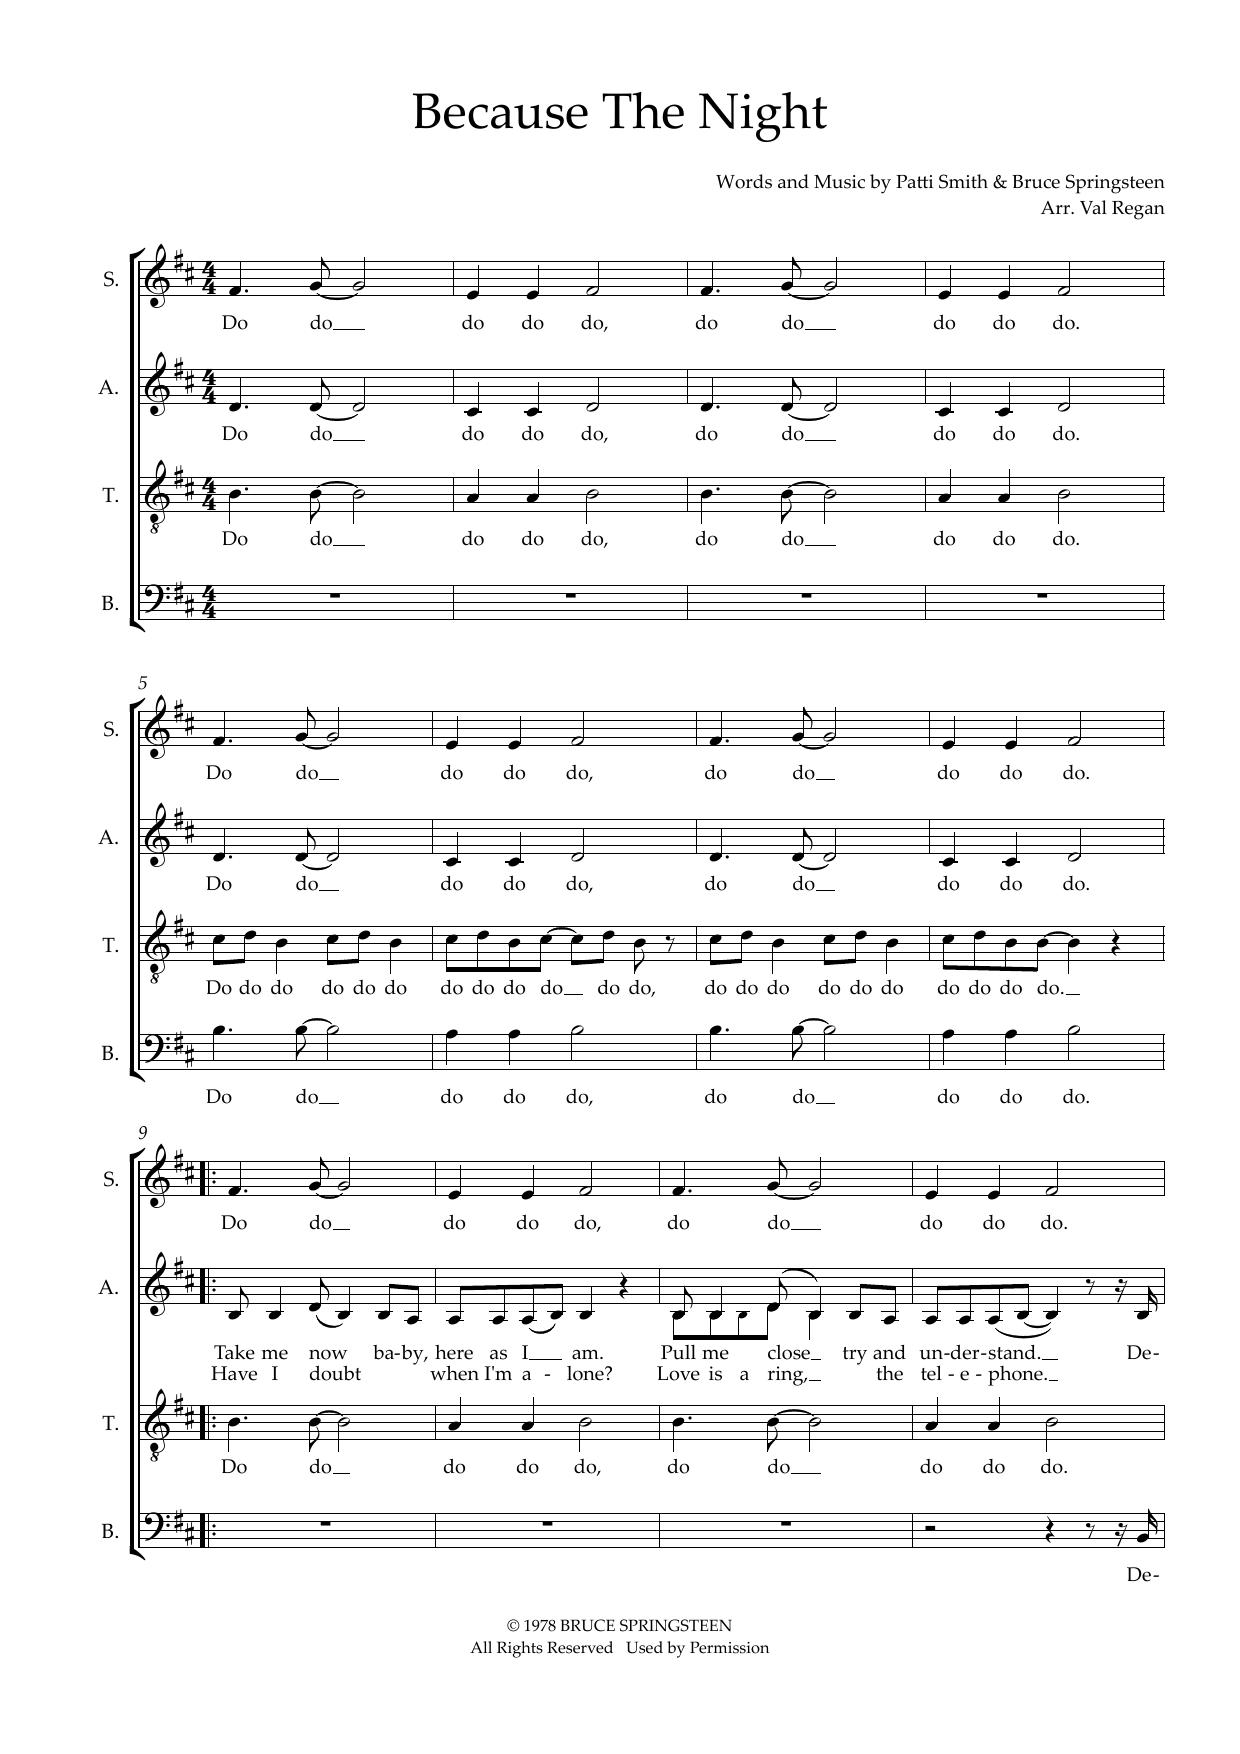 Because The Night (arr. Val Regan) Sheet Music